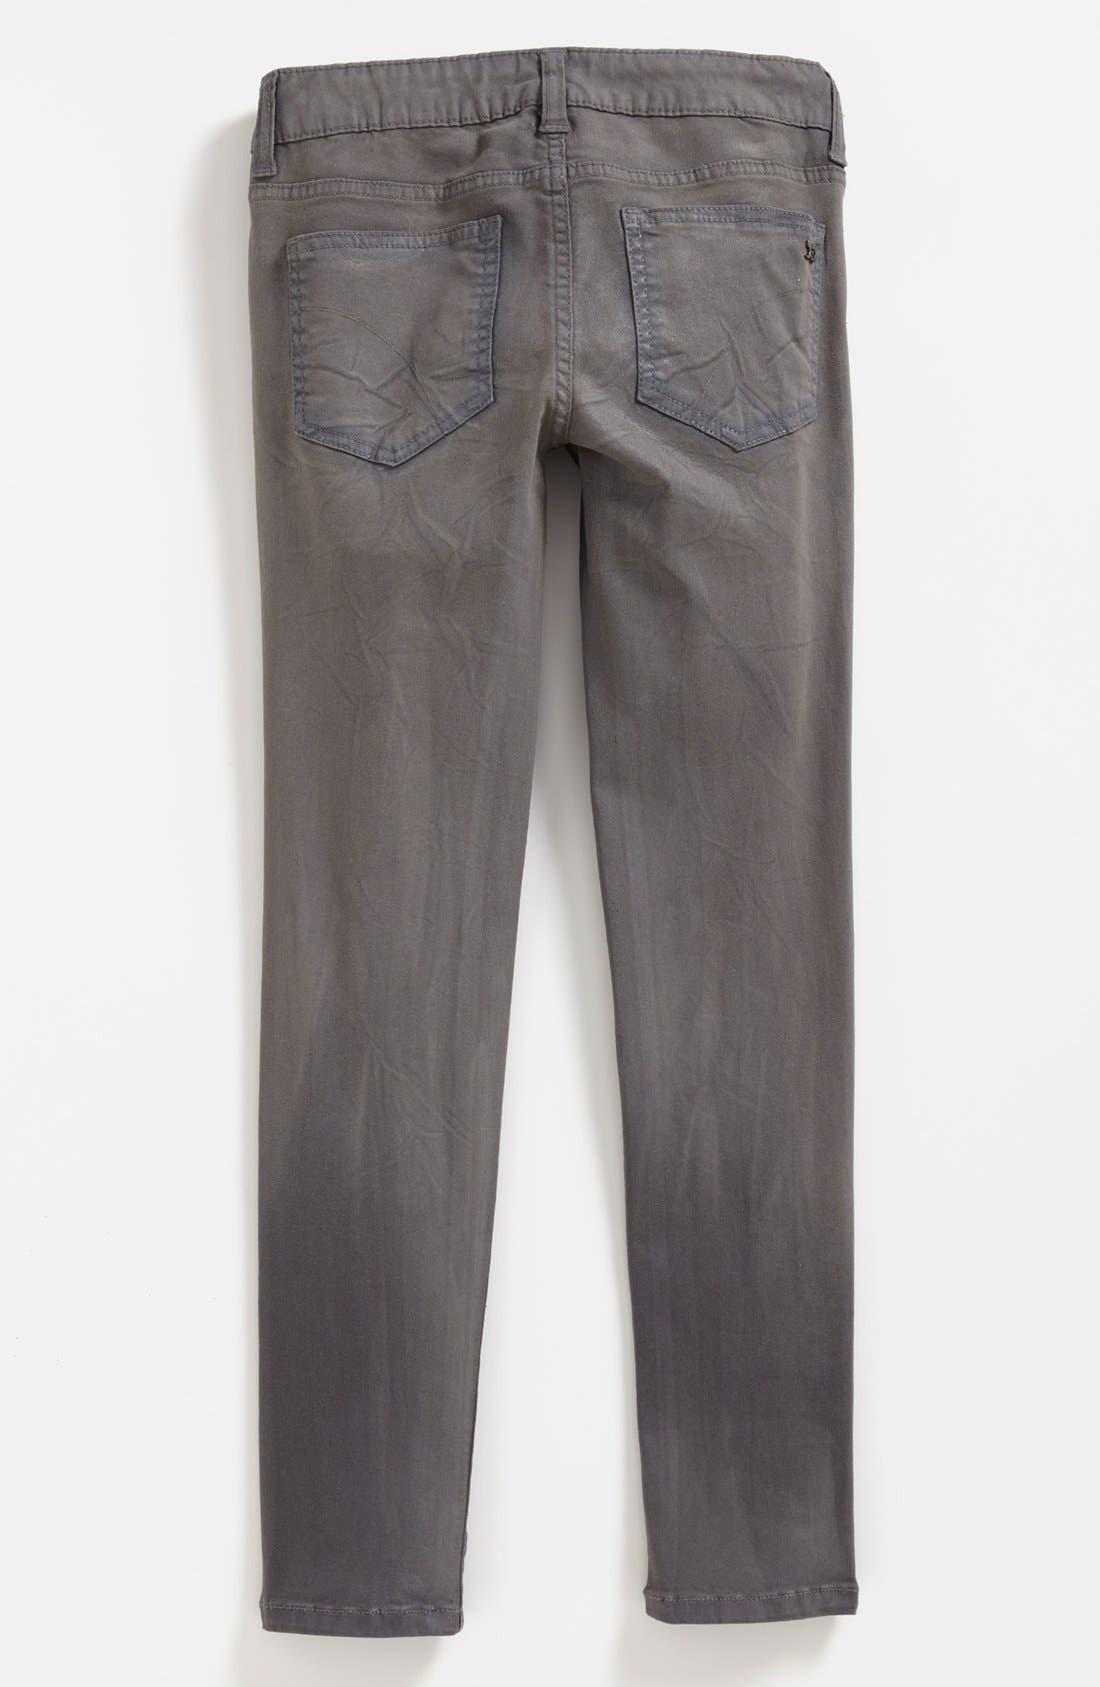 Alternate Image 1 Selected - Joe's Waxed Skinny Jeans (Big Girls)